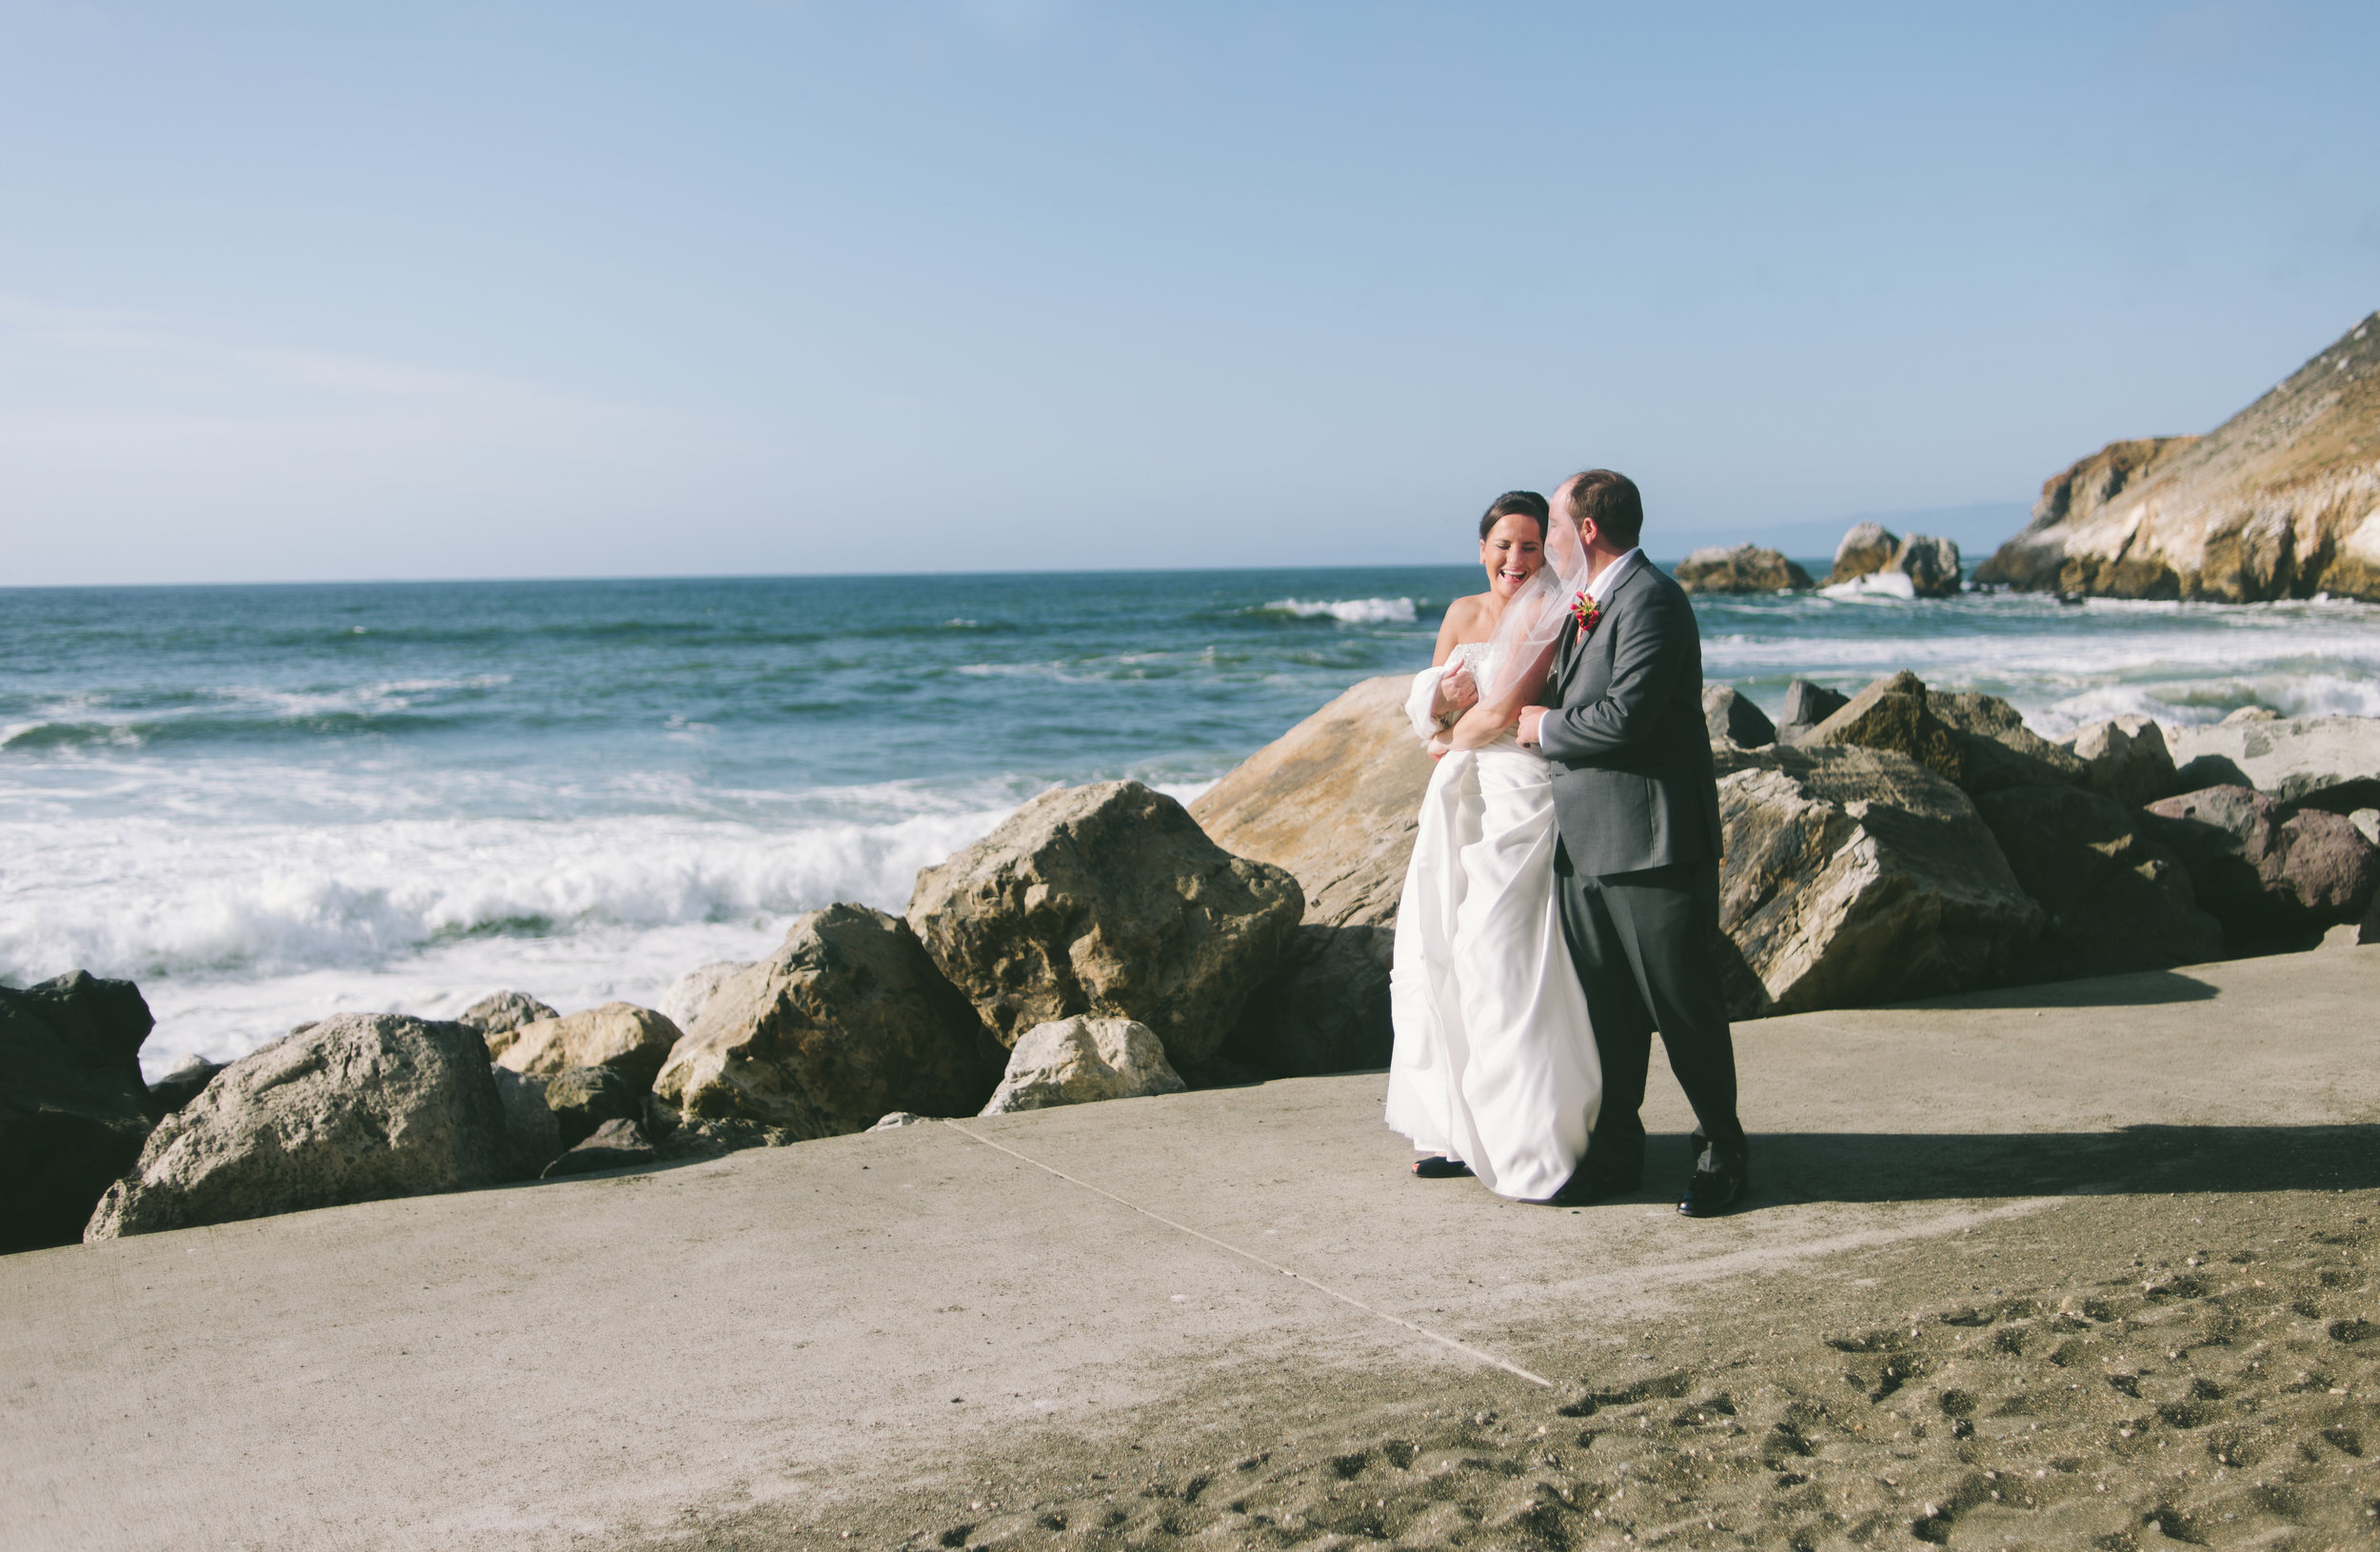 pacifica-moonraker-wedding-photography-52.jpg